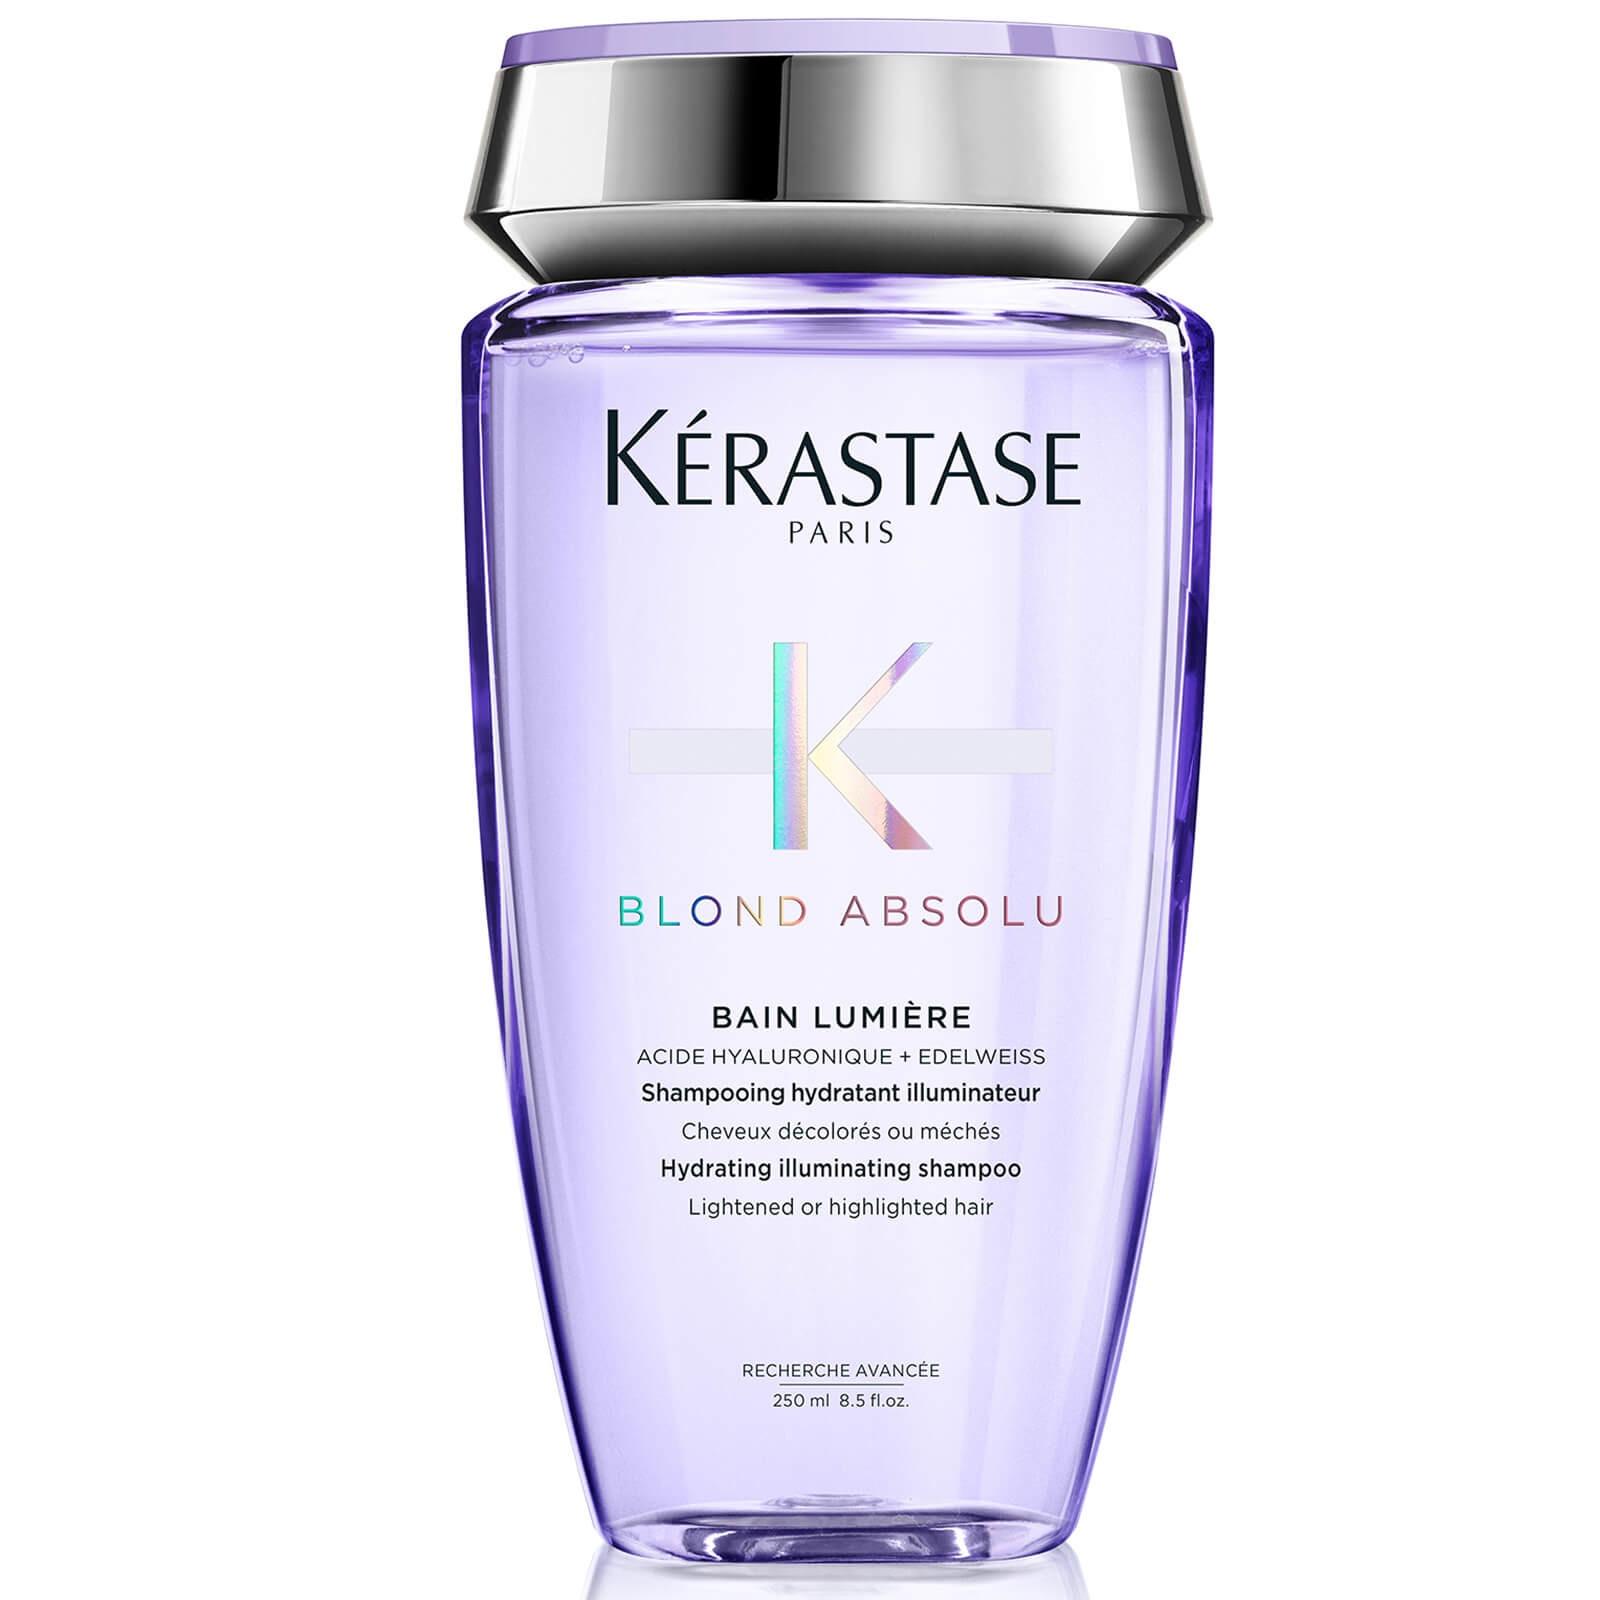 Kérastase 卡詩玻 玻尿酸水光洗發水 250ml